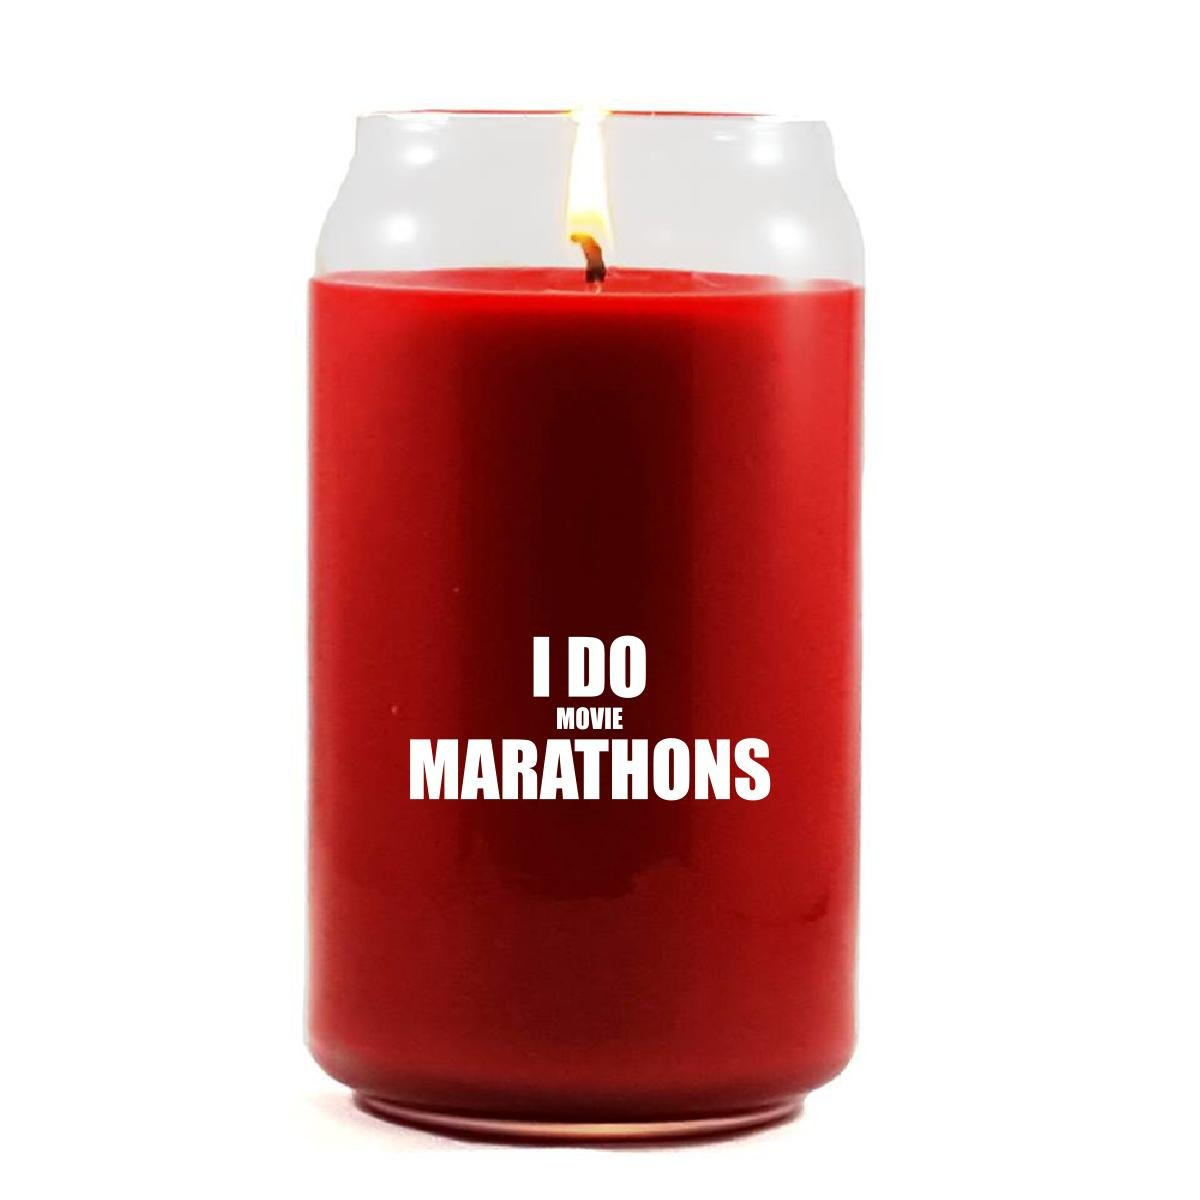 I Do Movie Marathons Binge Watching - Scented Candle